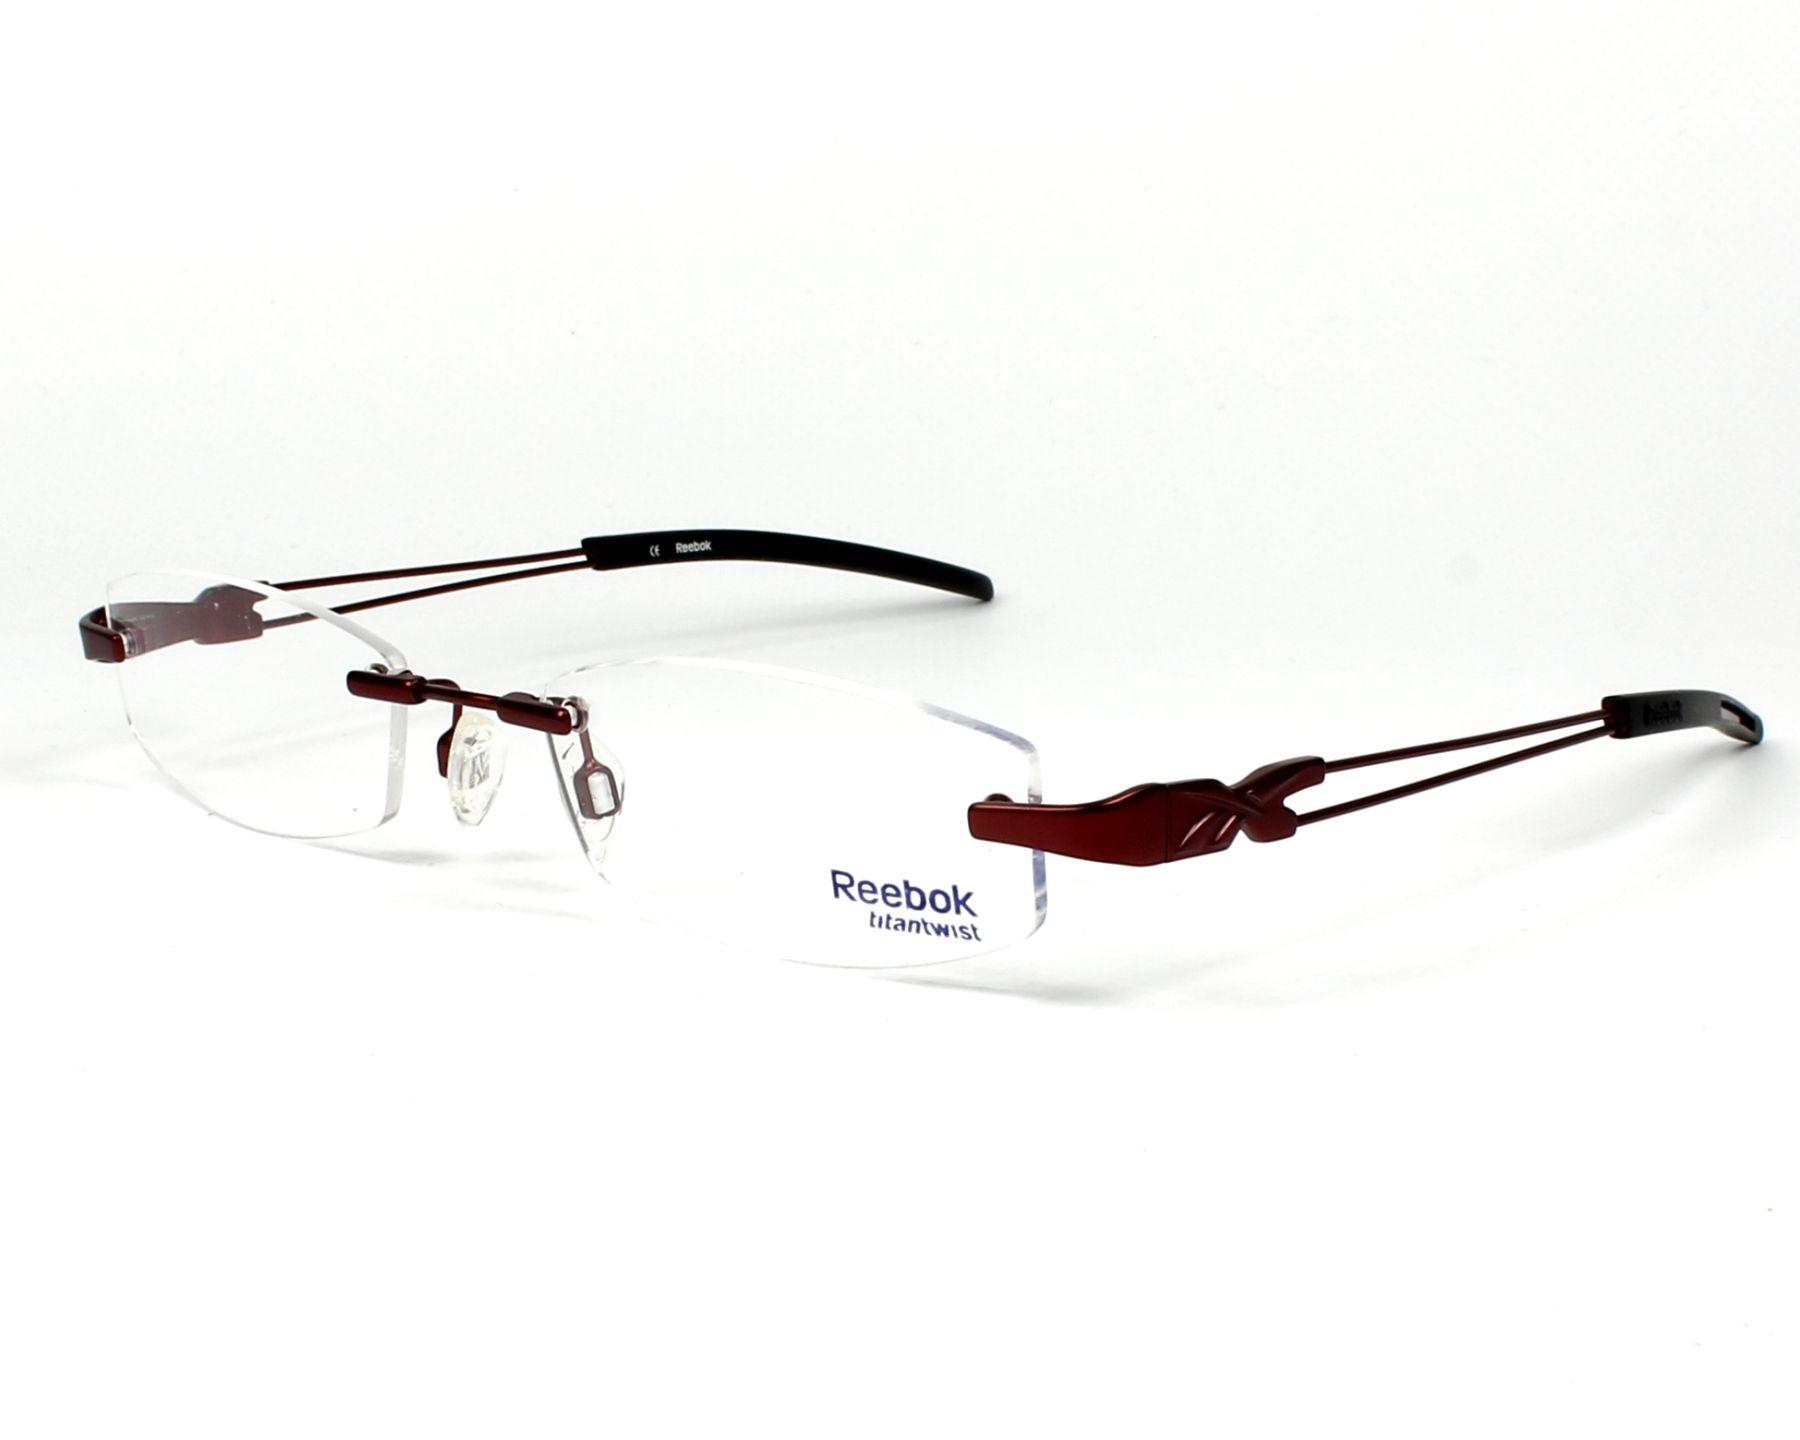 reebok lunettes homme 2016